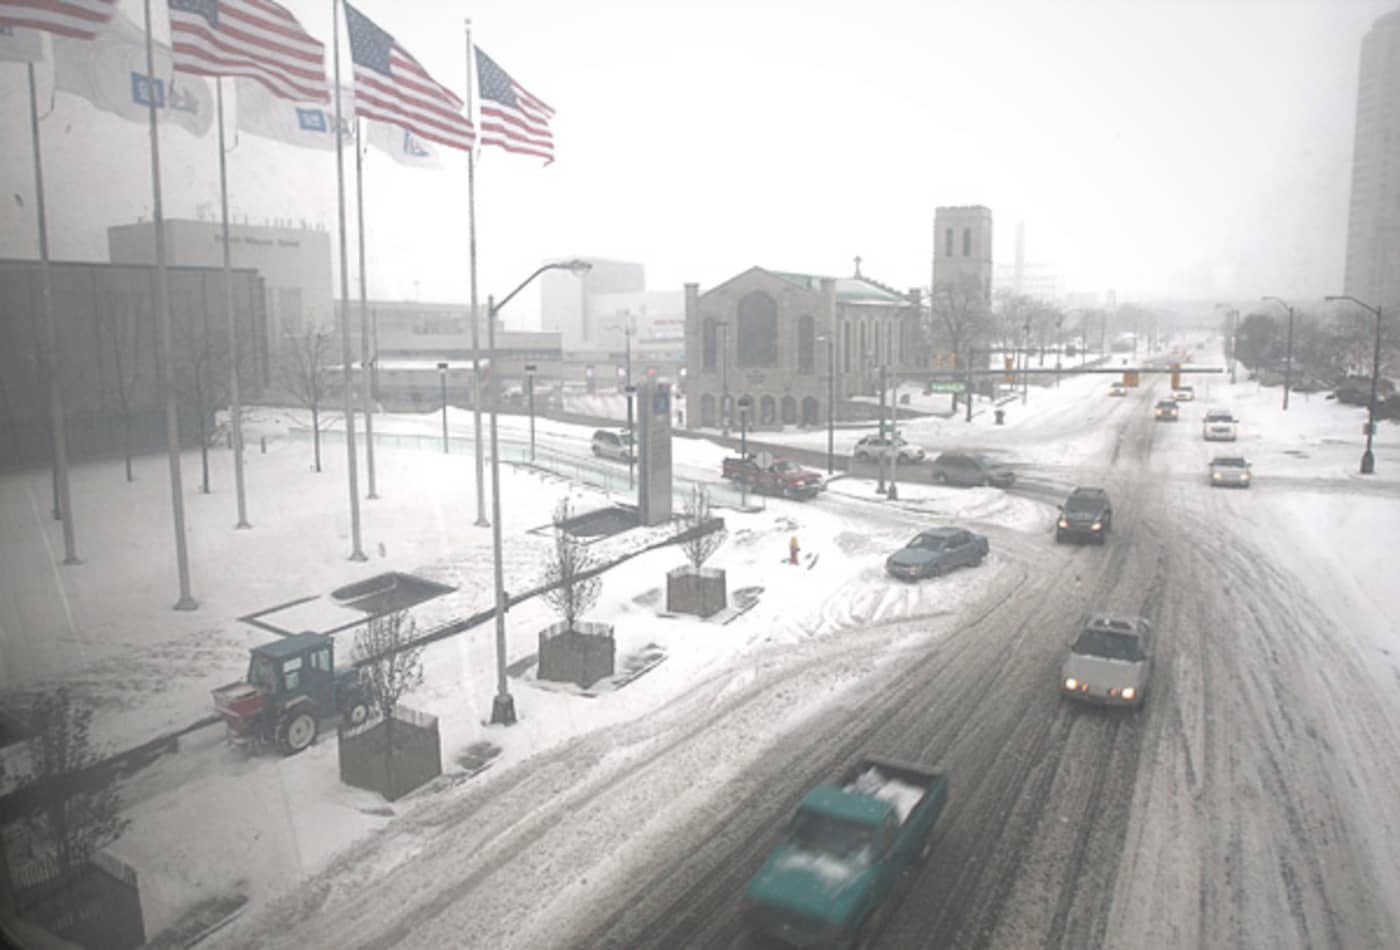 Detroit-Michigan-Most-Stressful-Cities-CNBC.jpg